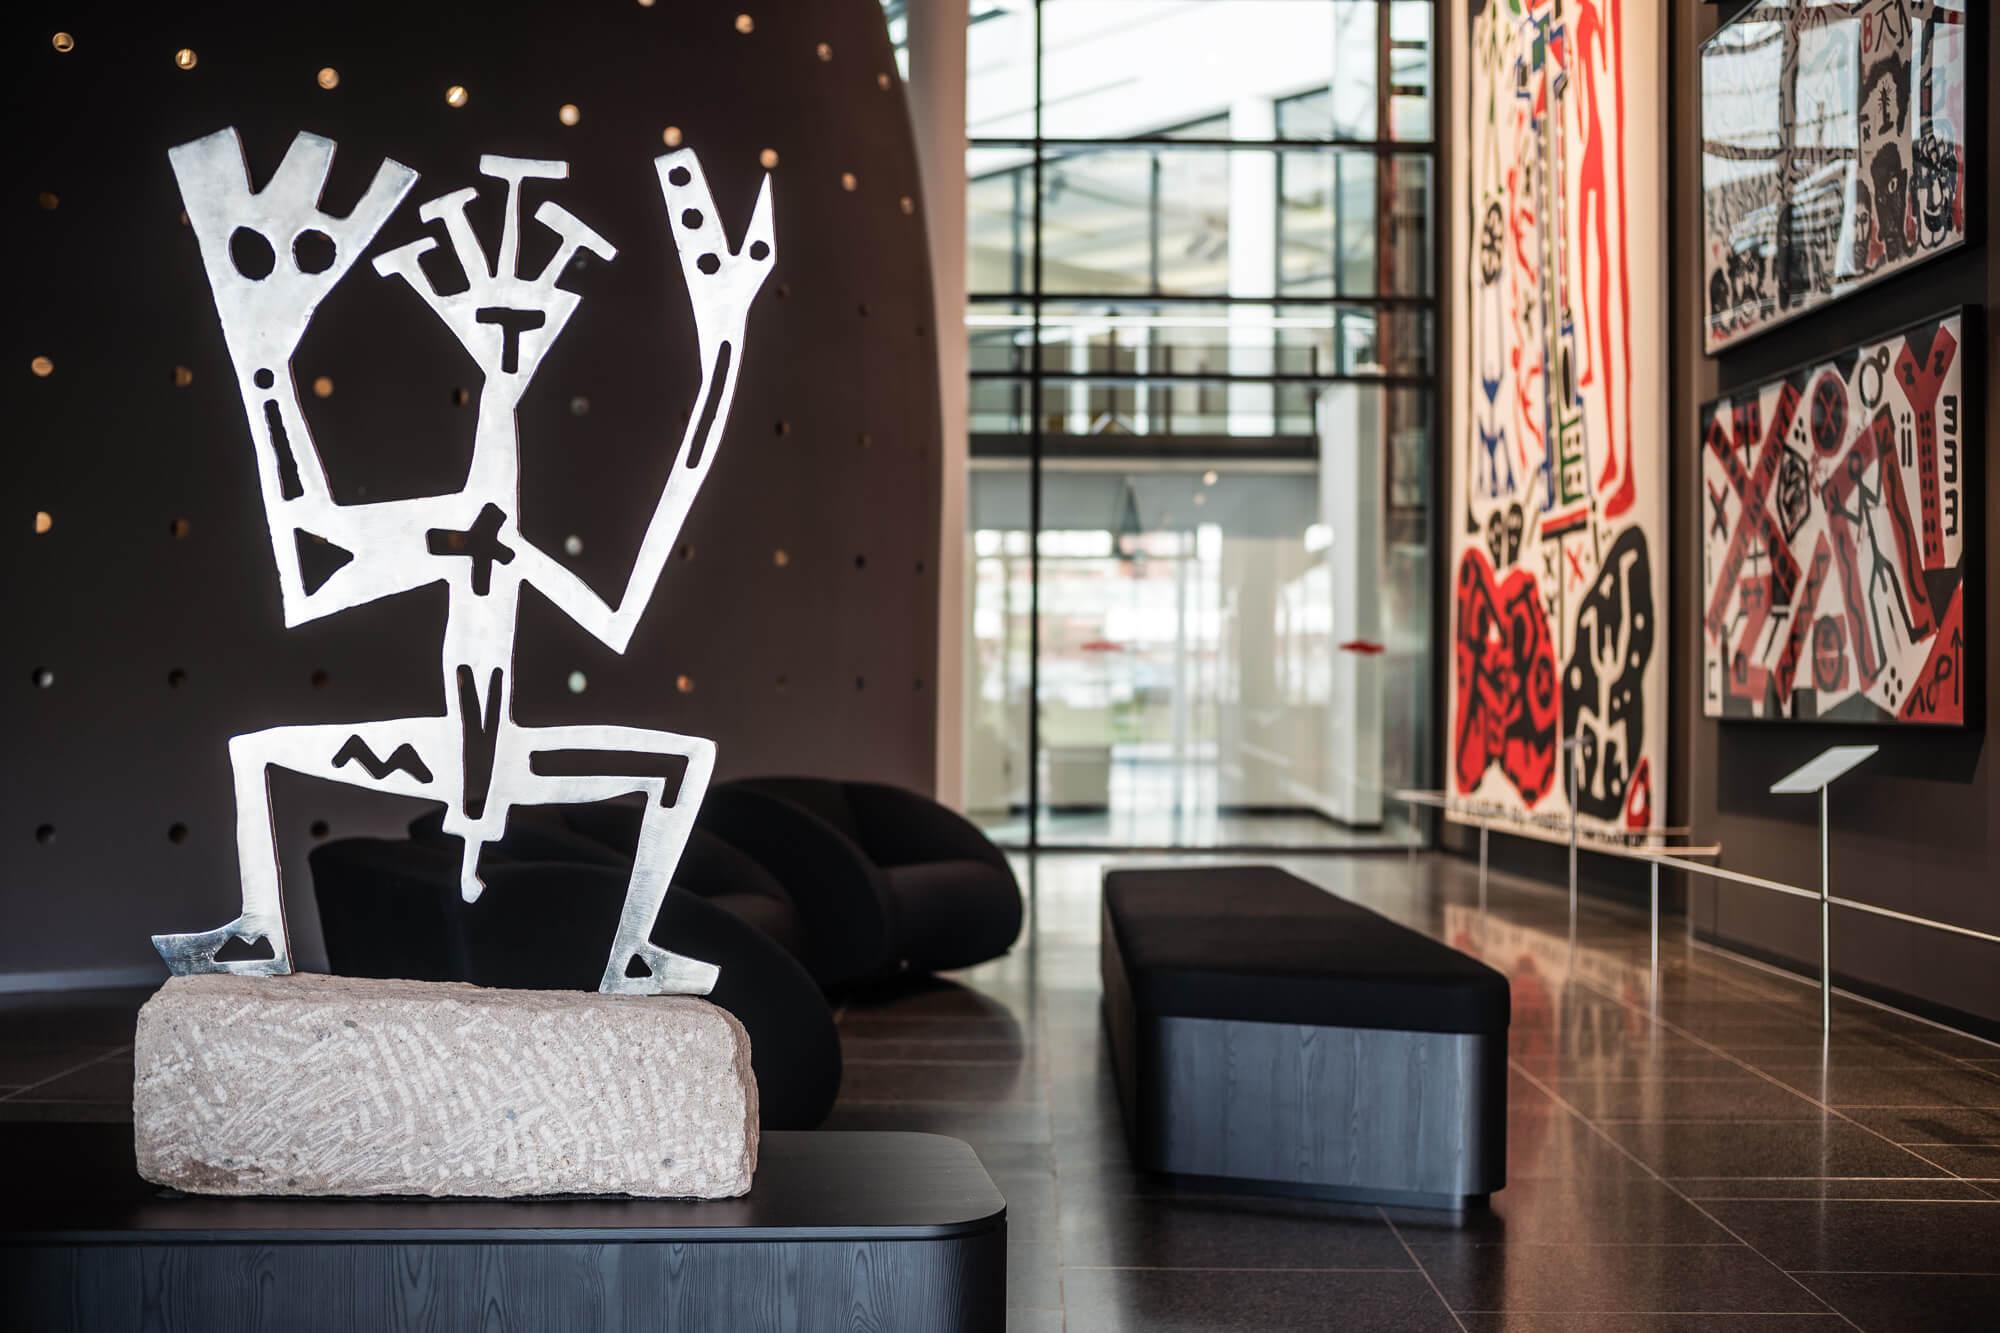 A.R. Penck Skulptur in der Lobby